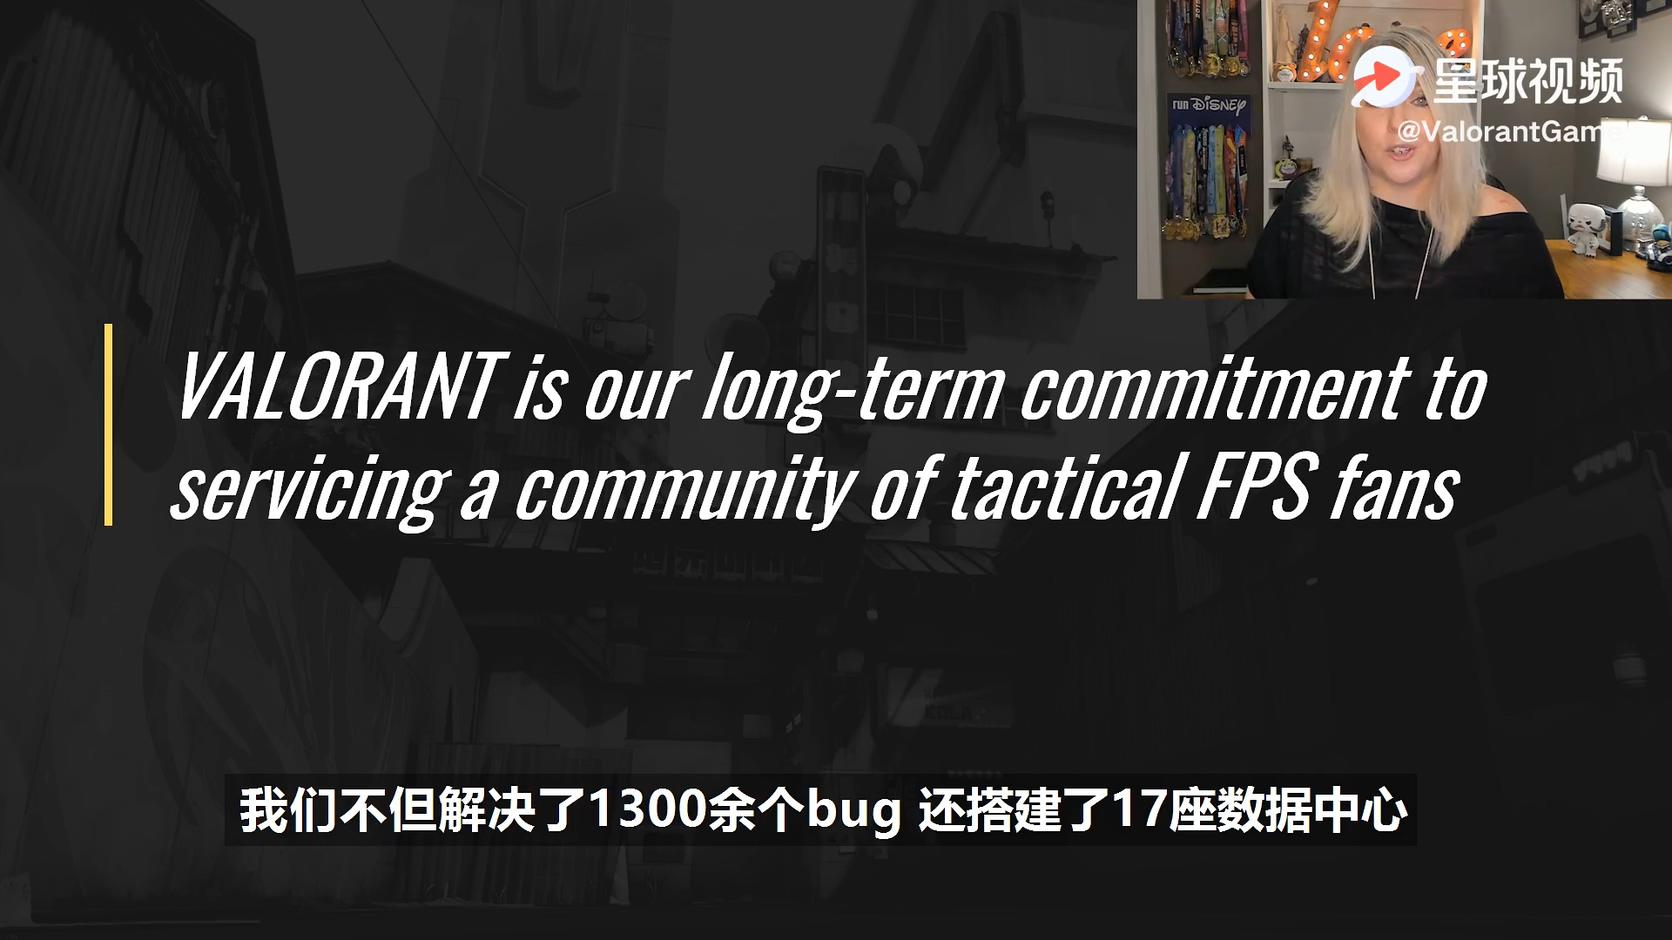 《Valorant》談反作弊:做最重視玩家的FPS遊戲